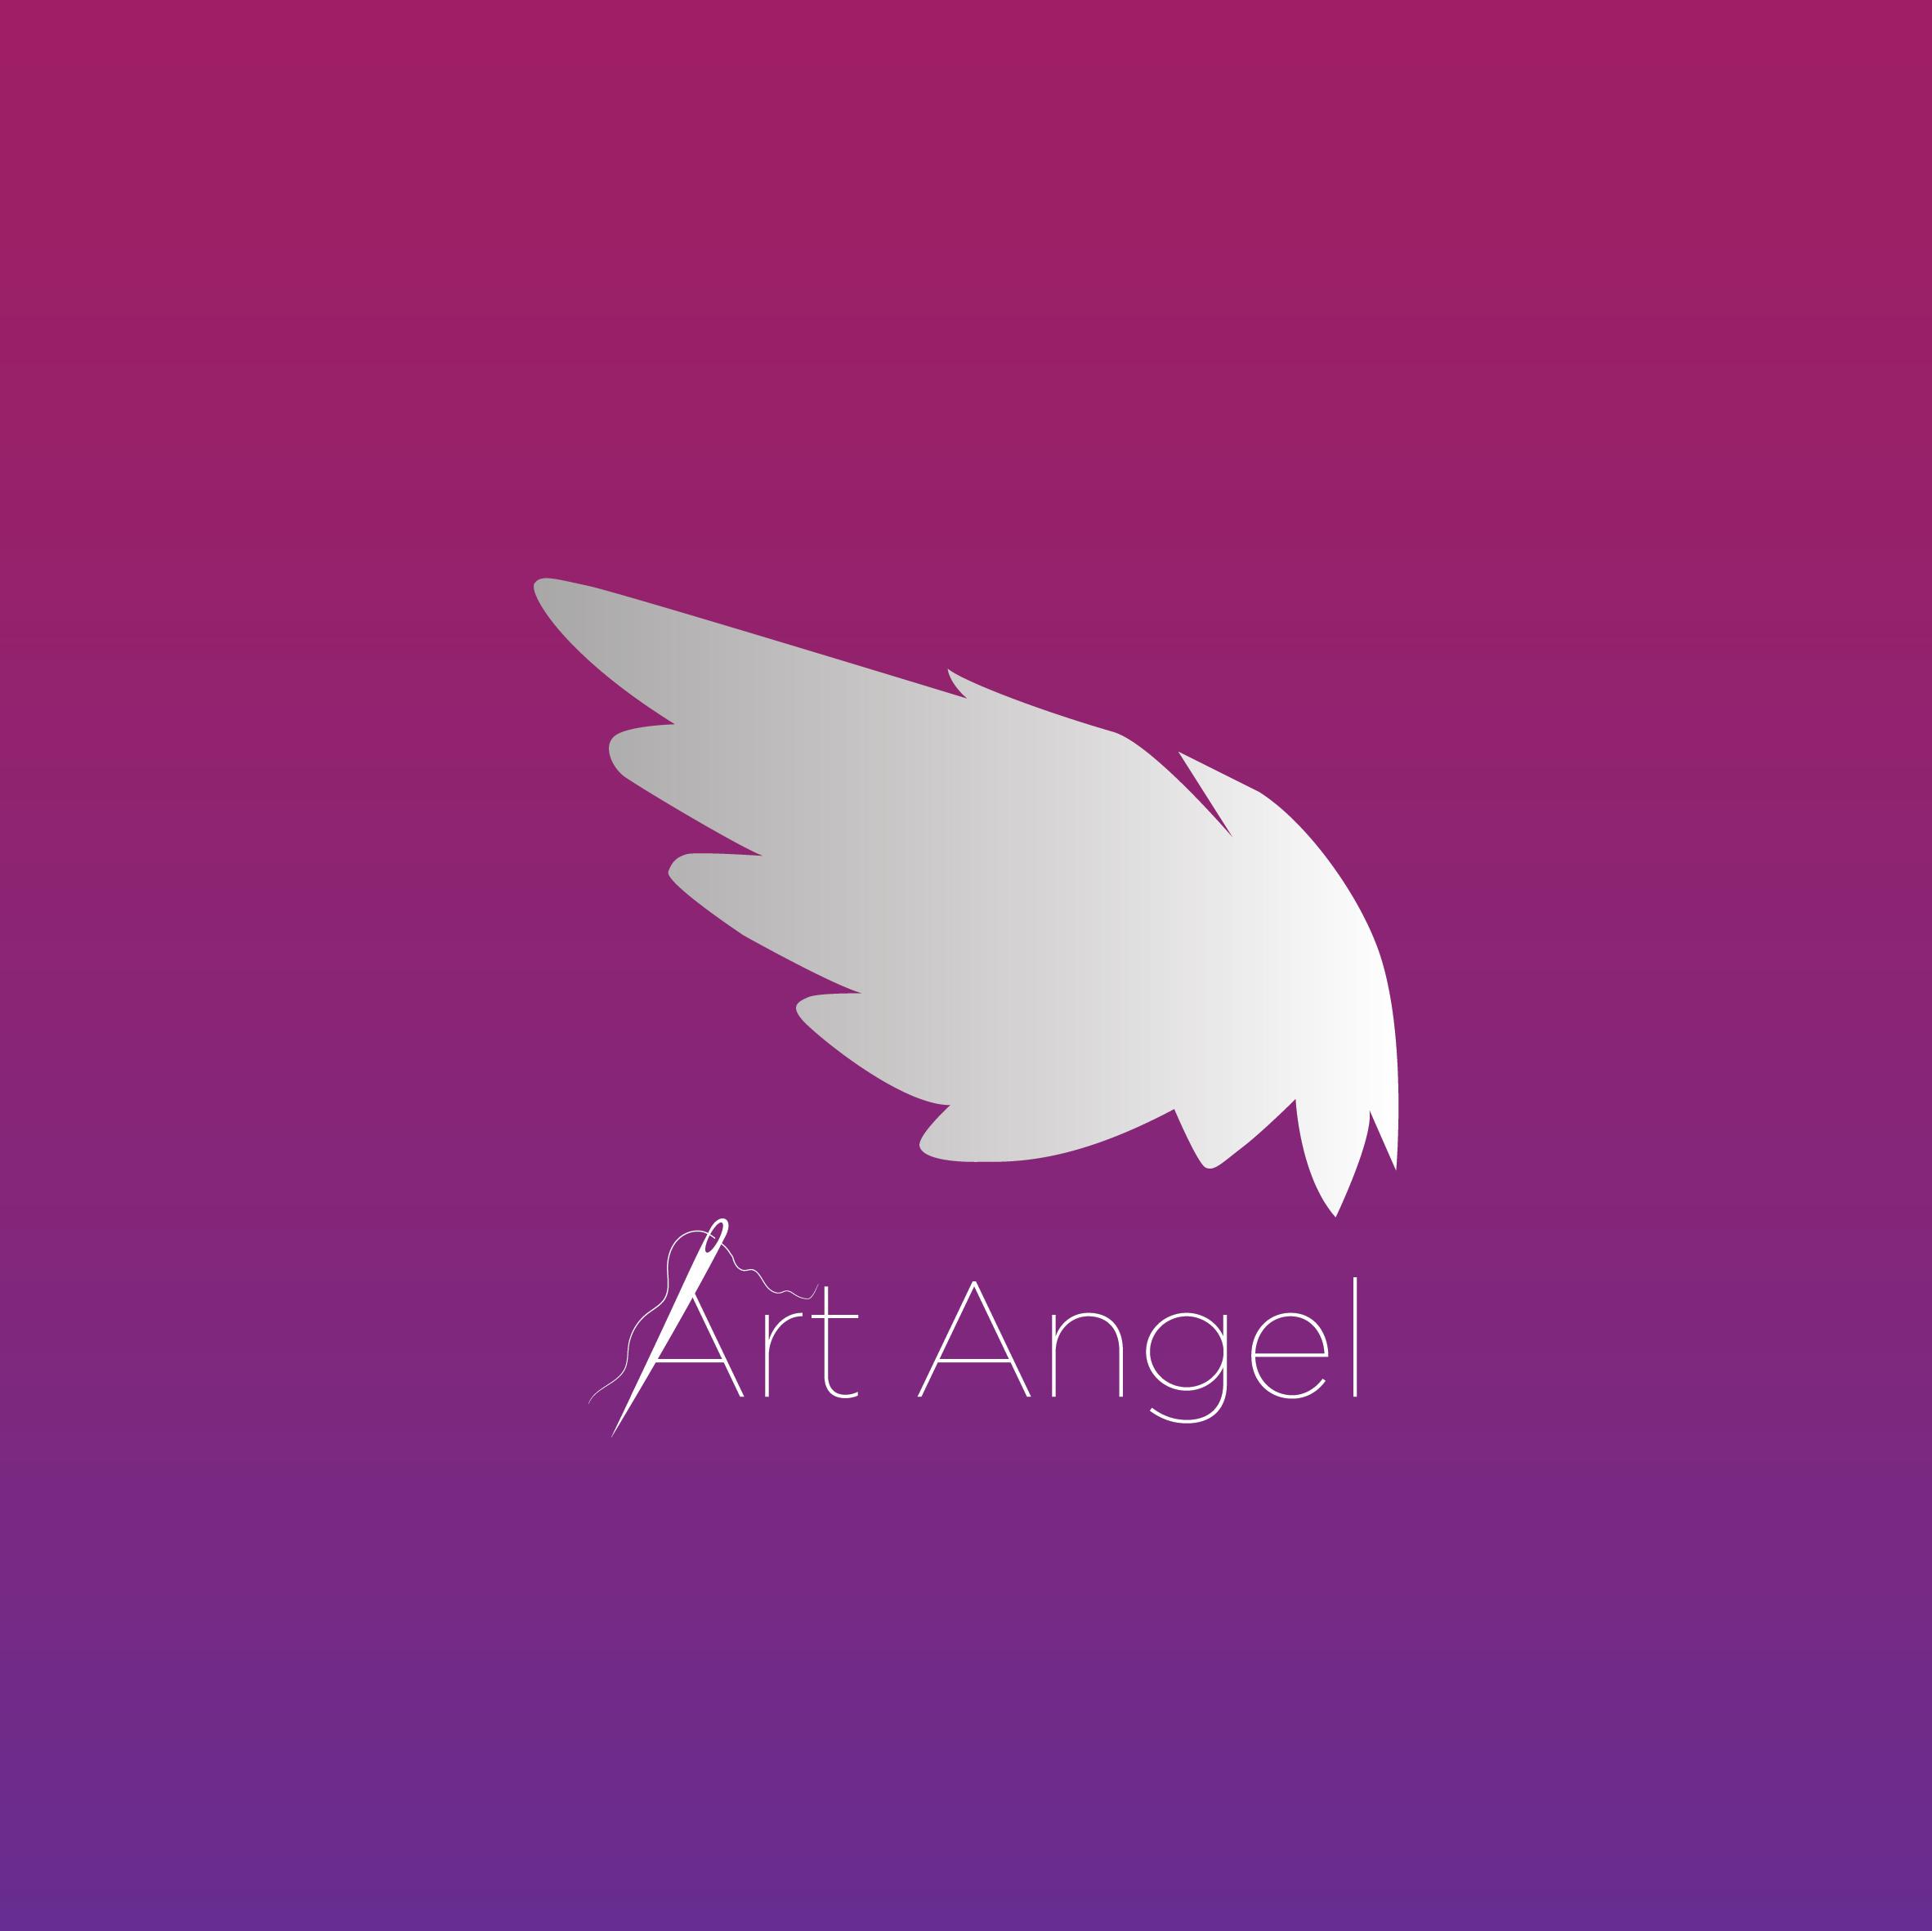 ArtAngel_Square_JPG